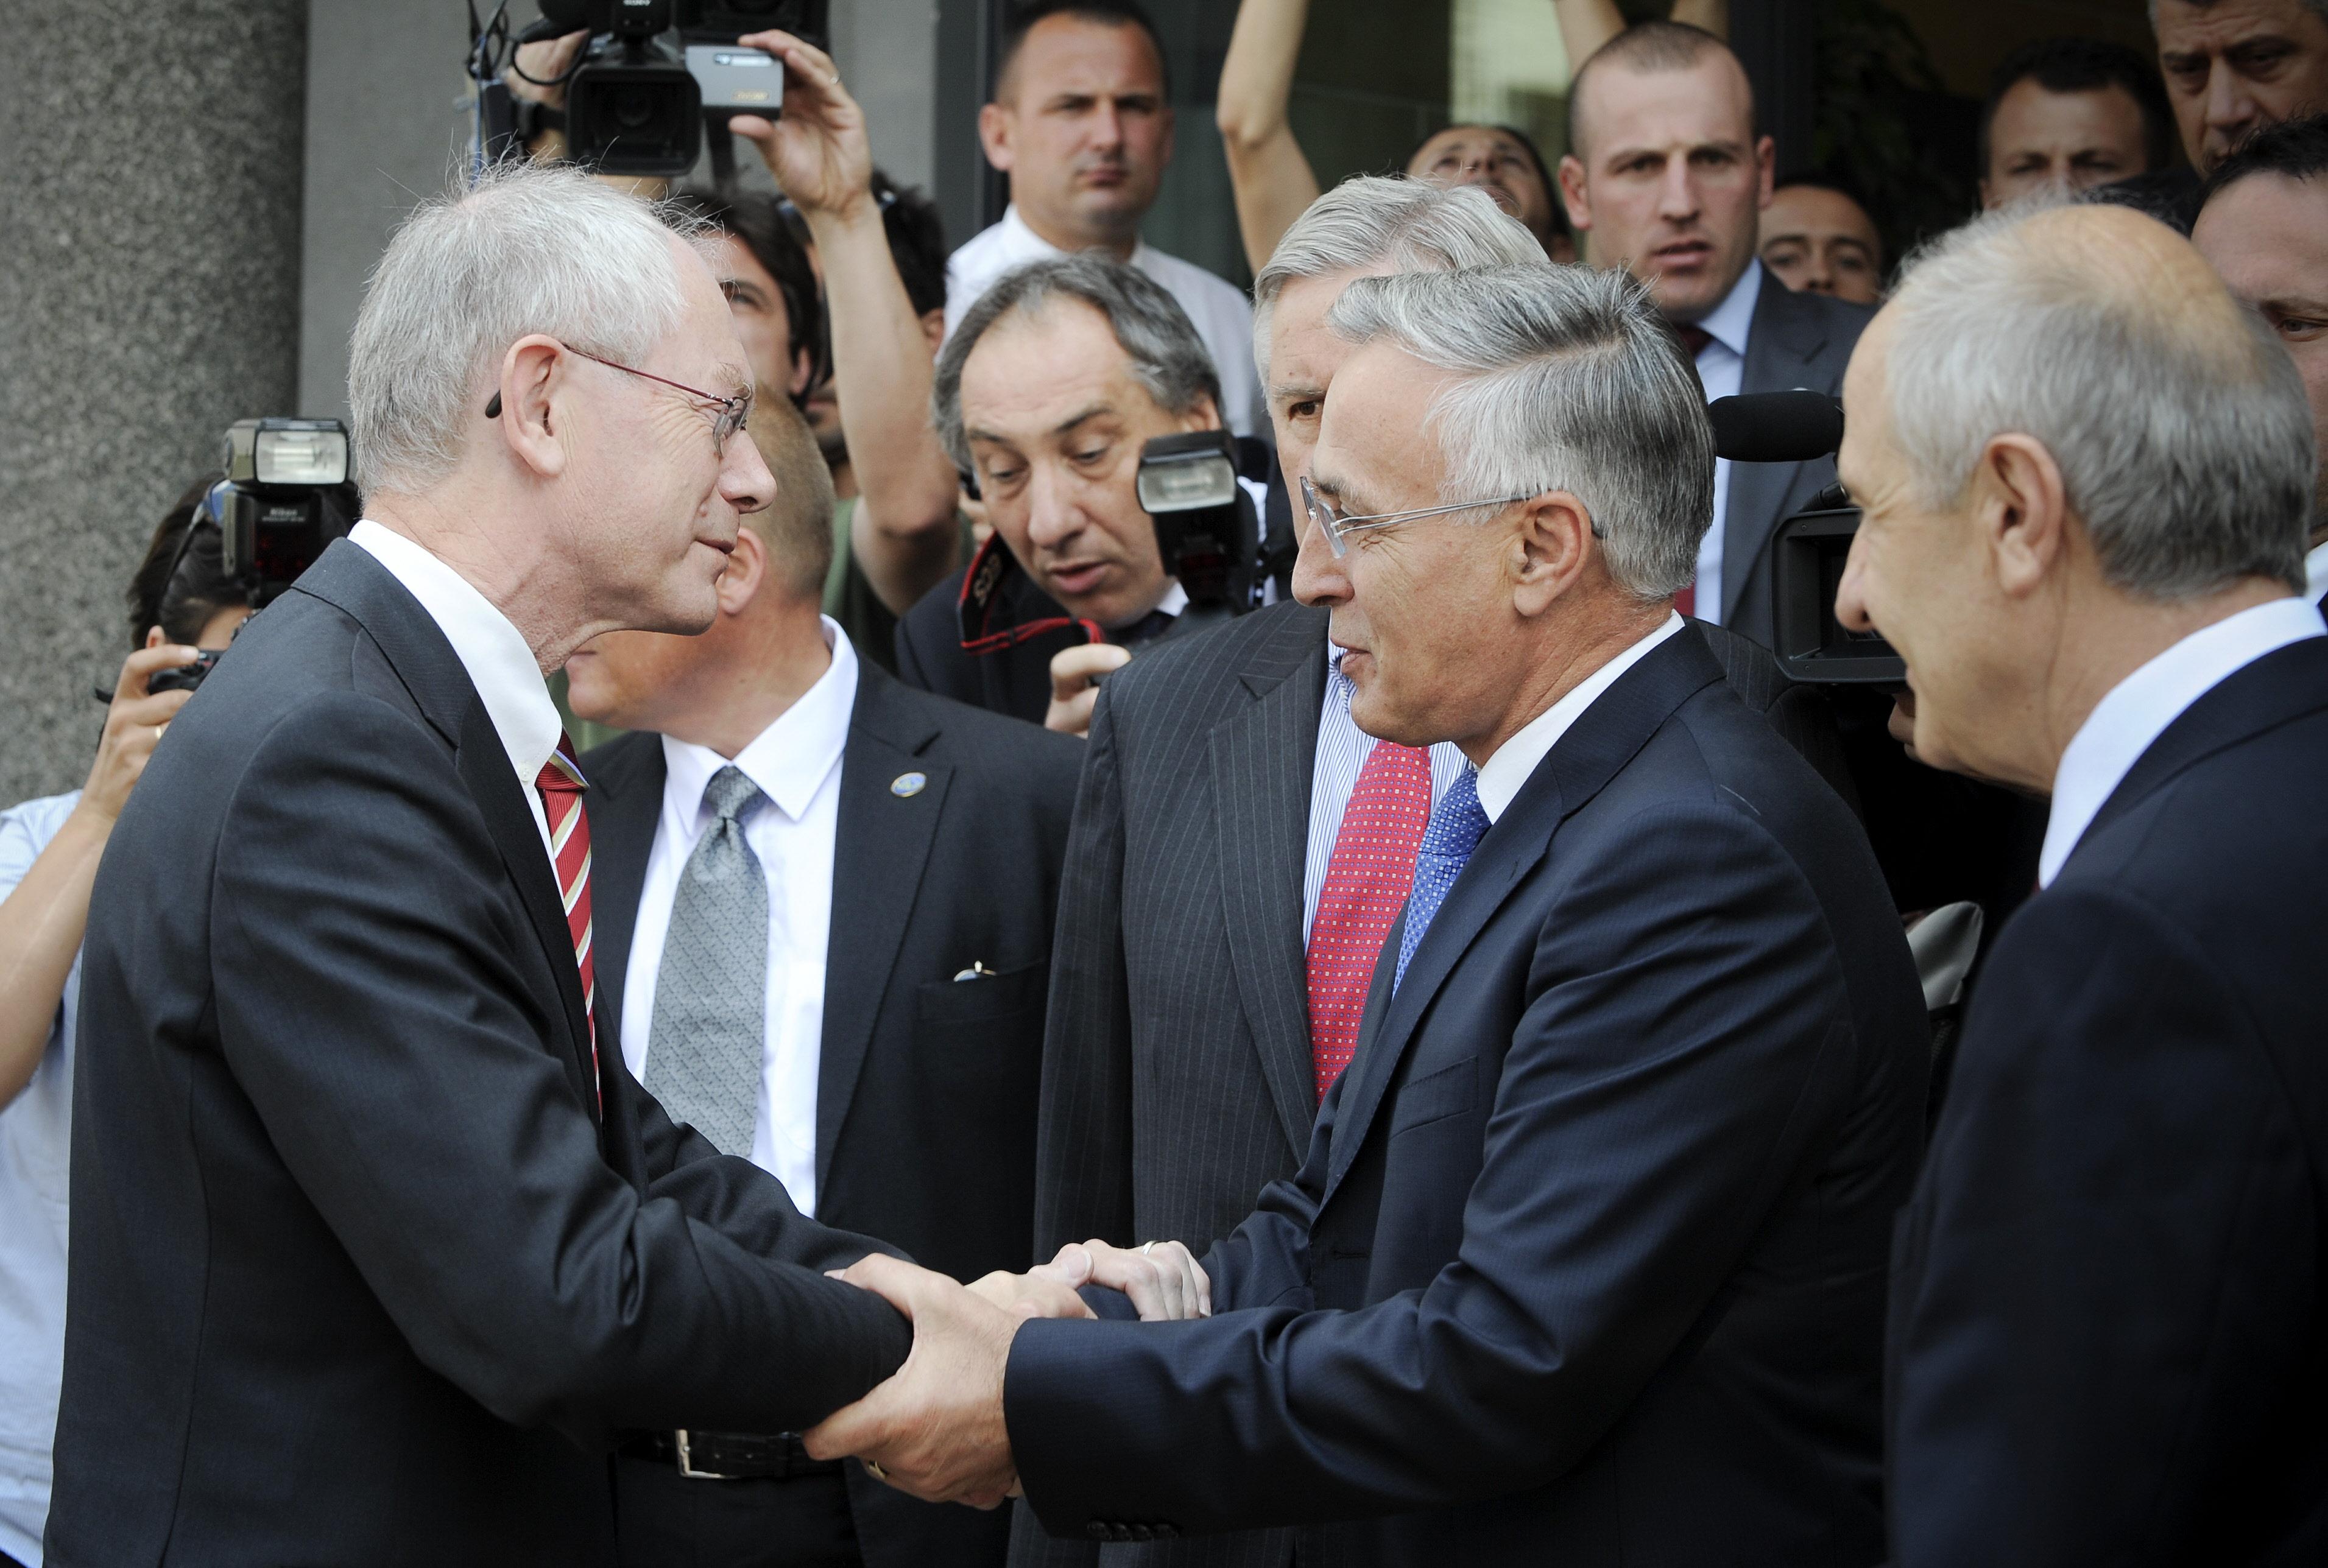 Kosovo war crimes suspect Krasniqi arrested, sent to The Hague